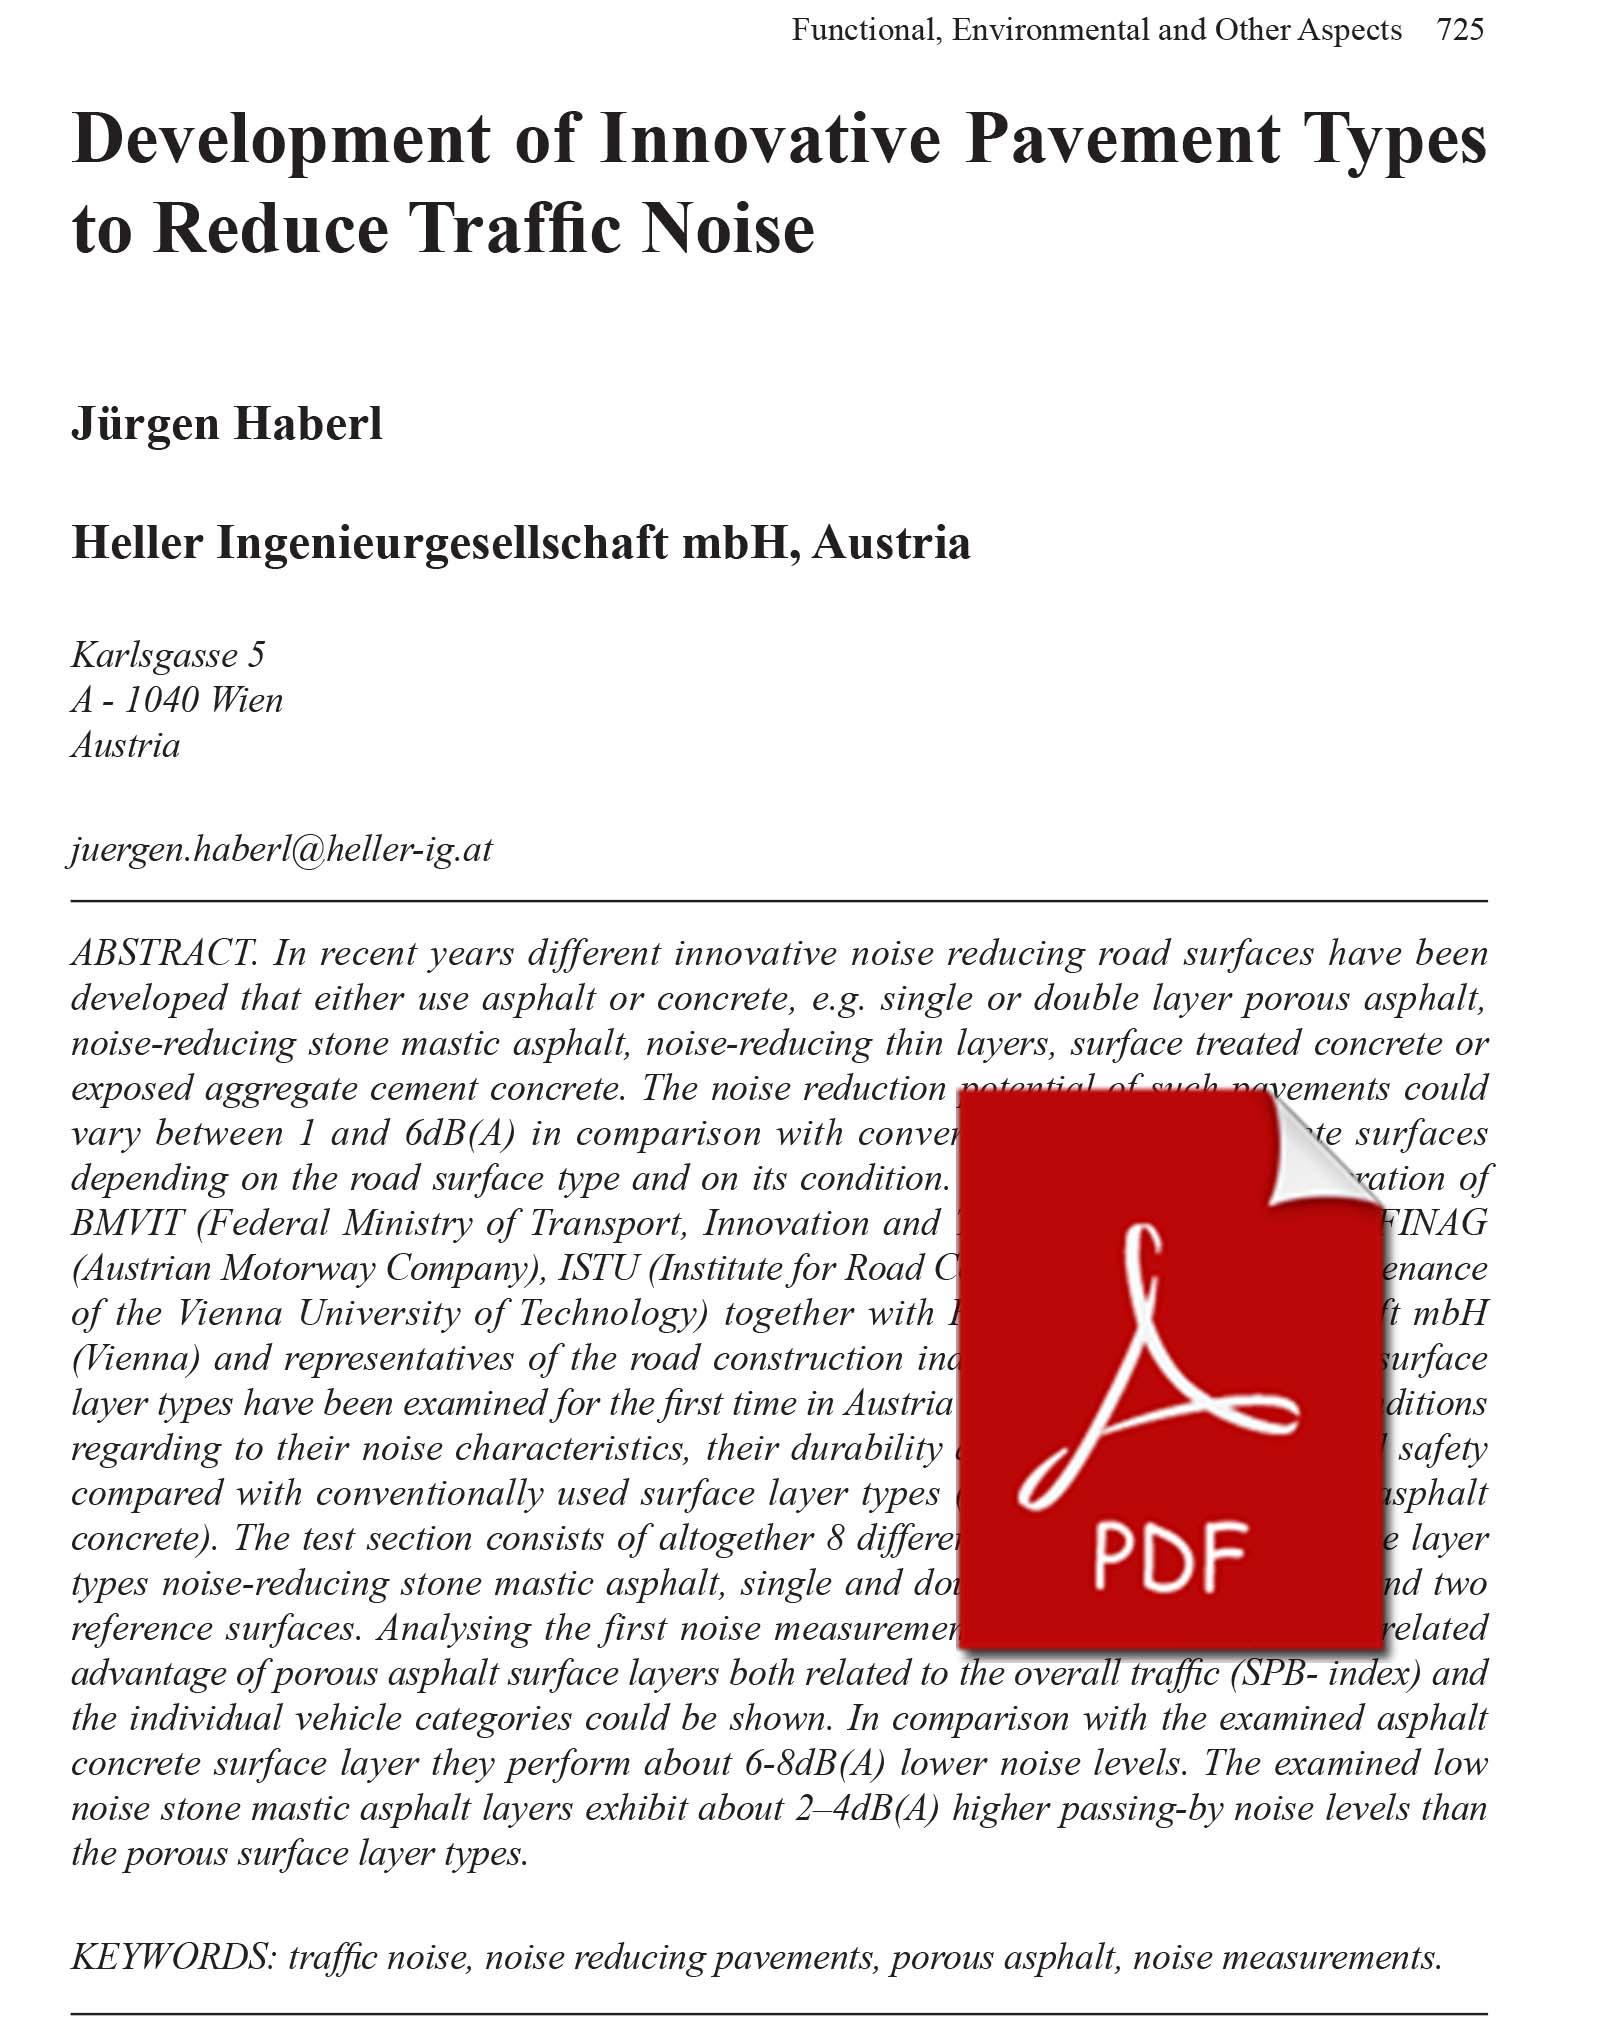 Development of Innovative Pavement Types to Reduce Traffic Noise